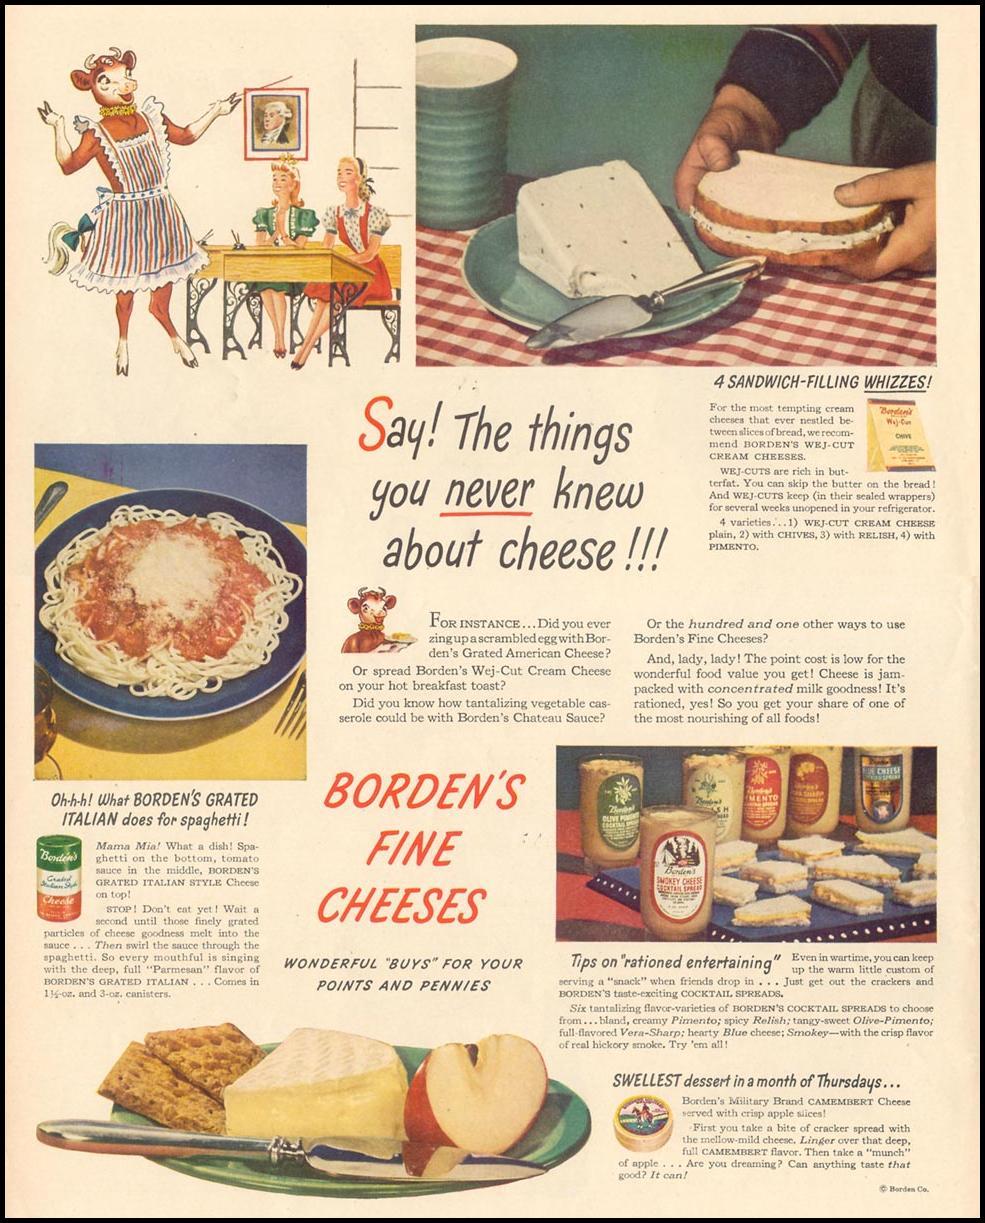 BORDEN'S FINE CHEESES LIFE 02/28/1944